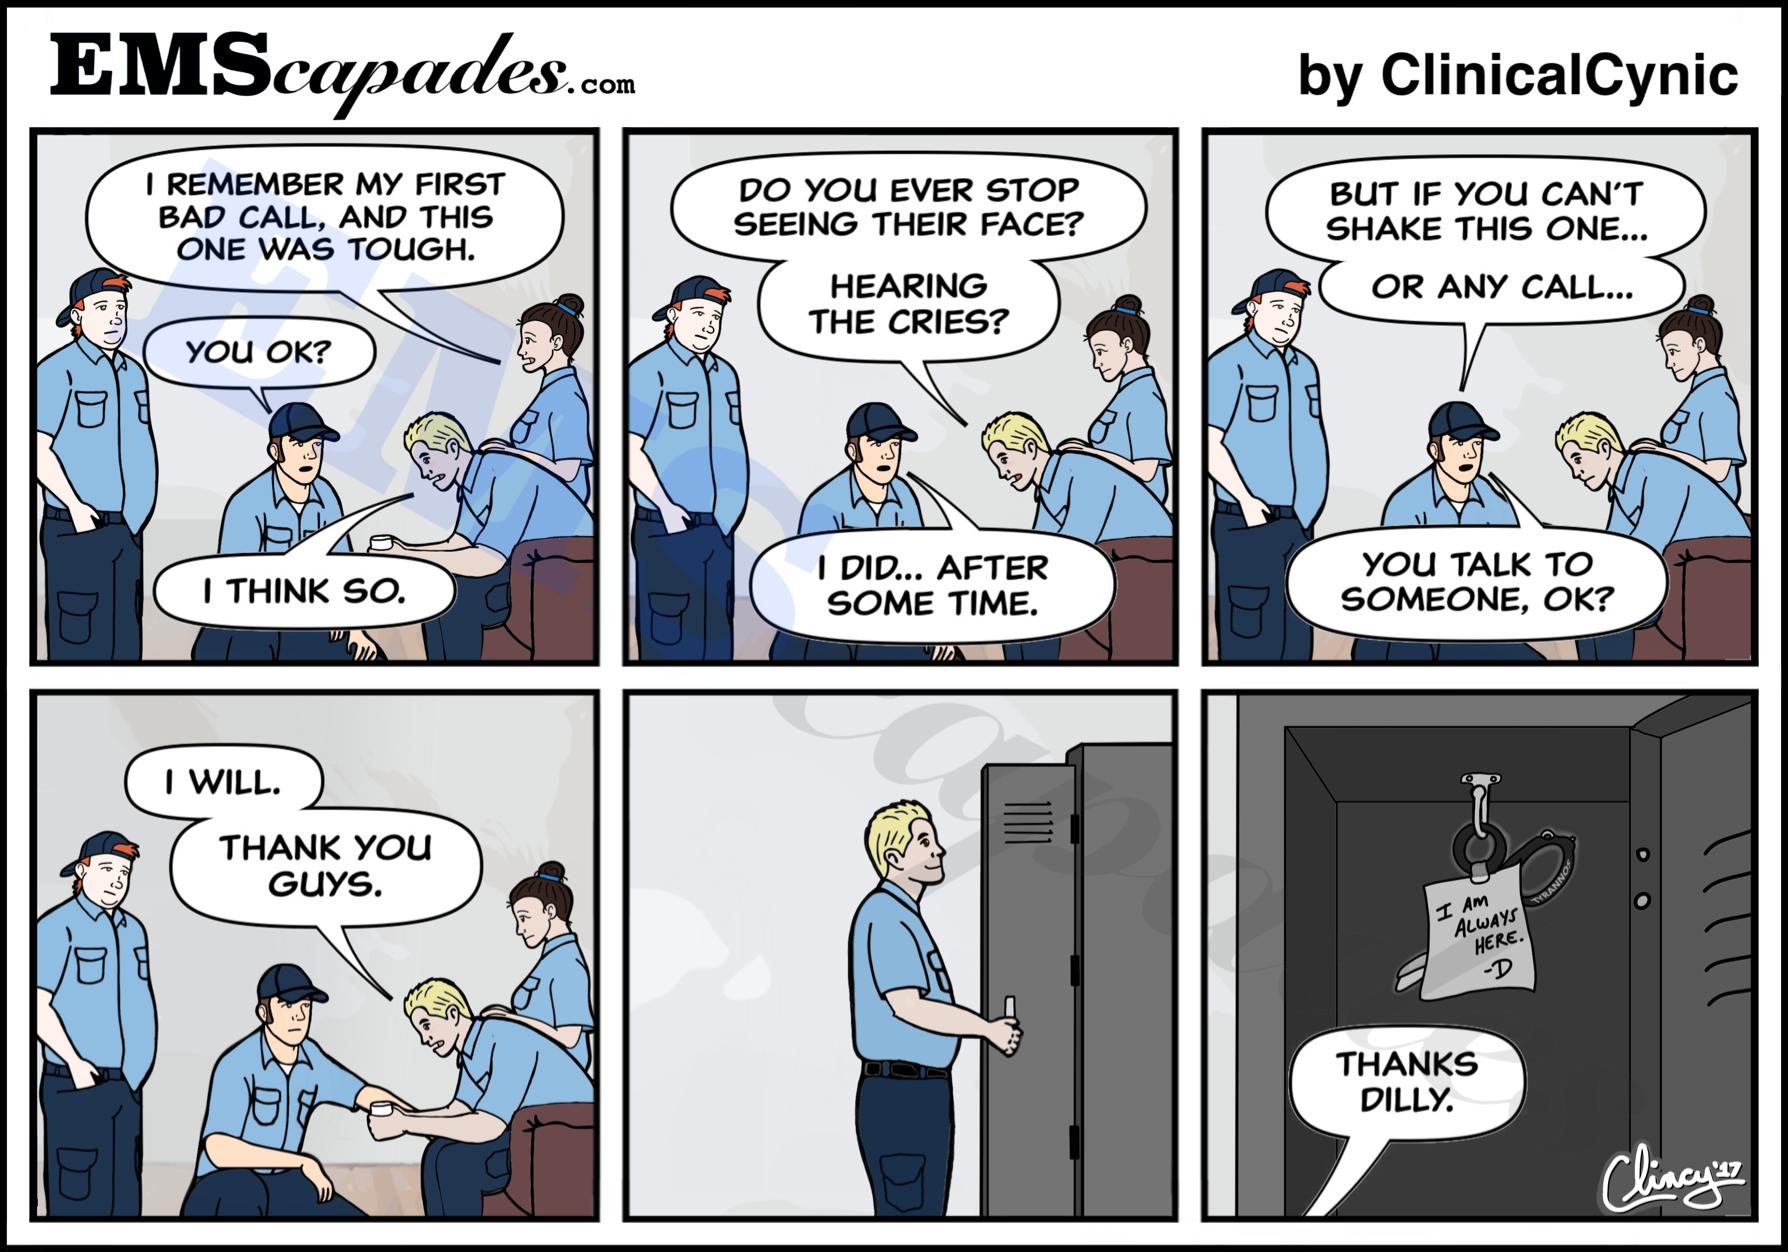 EMScapades - The EMS Comic